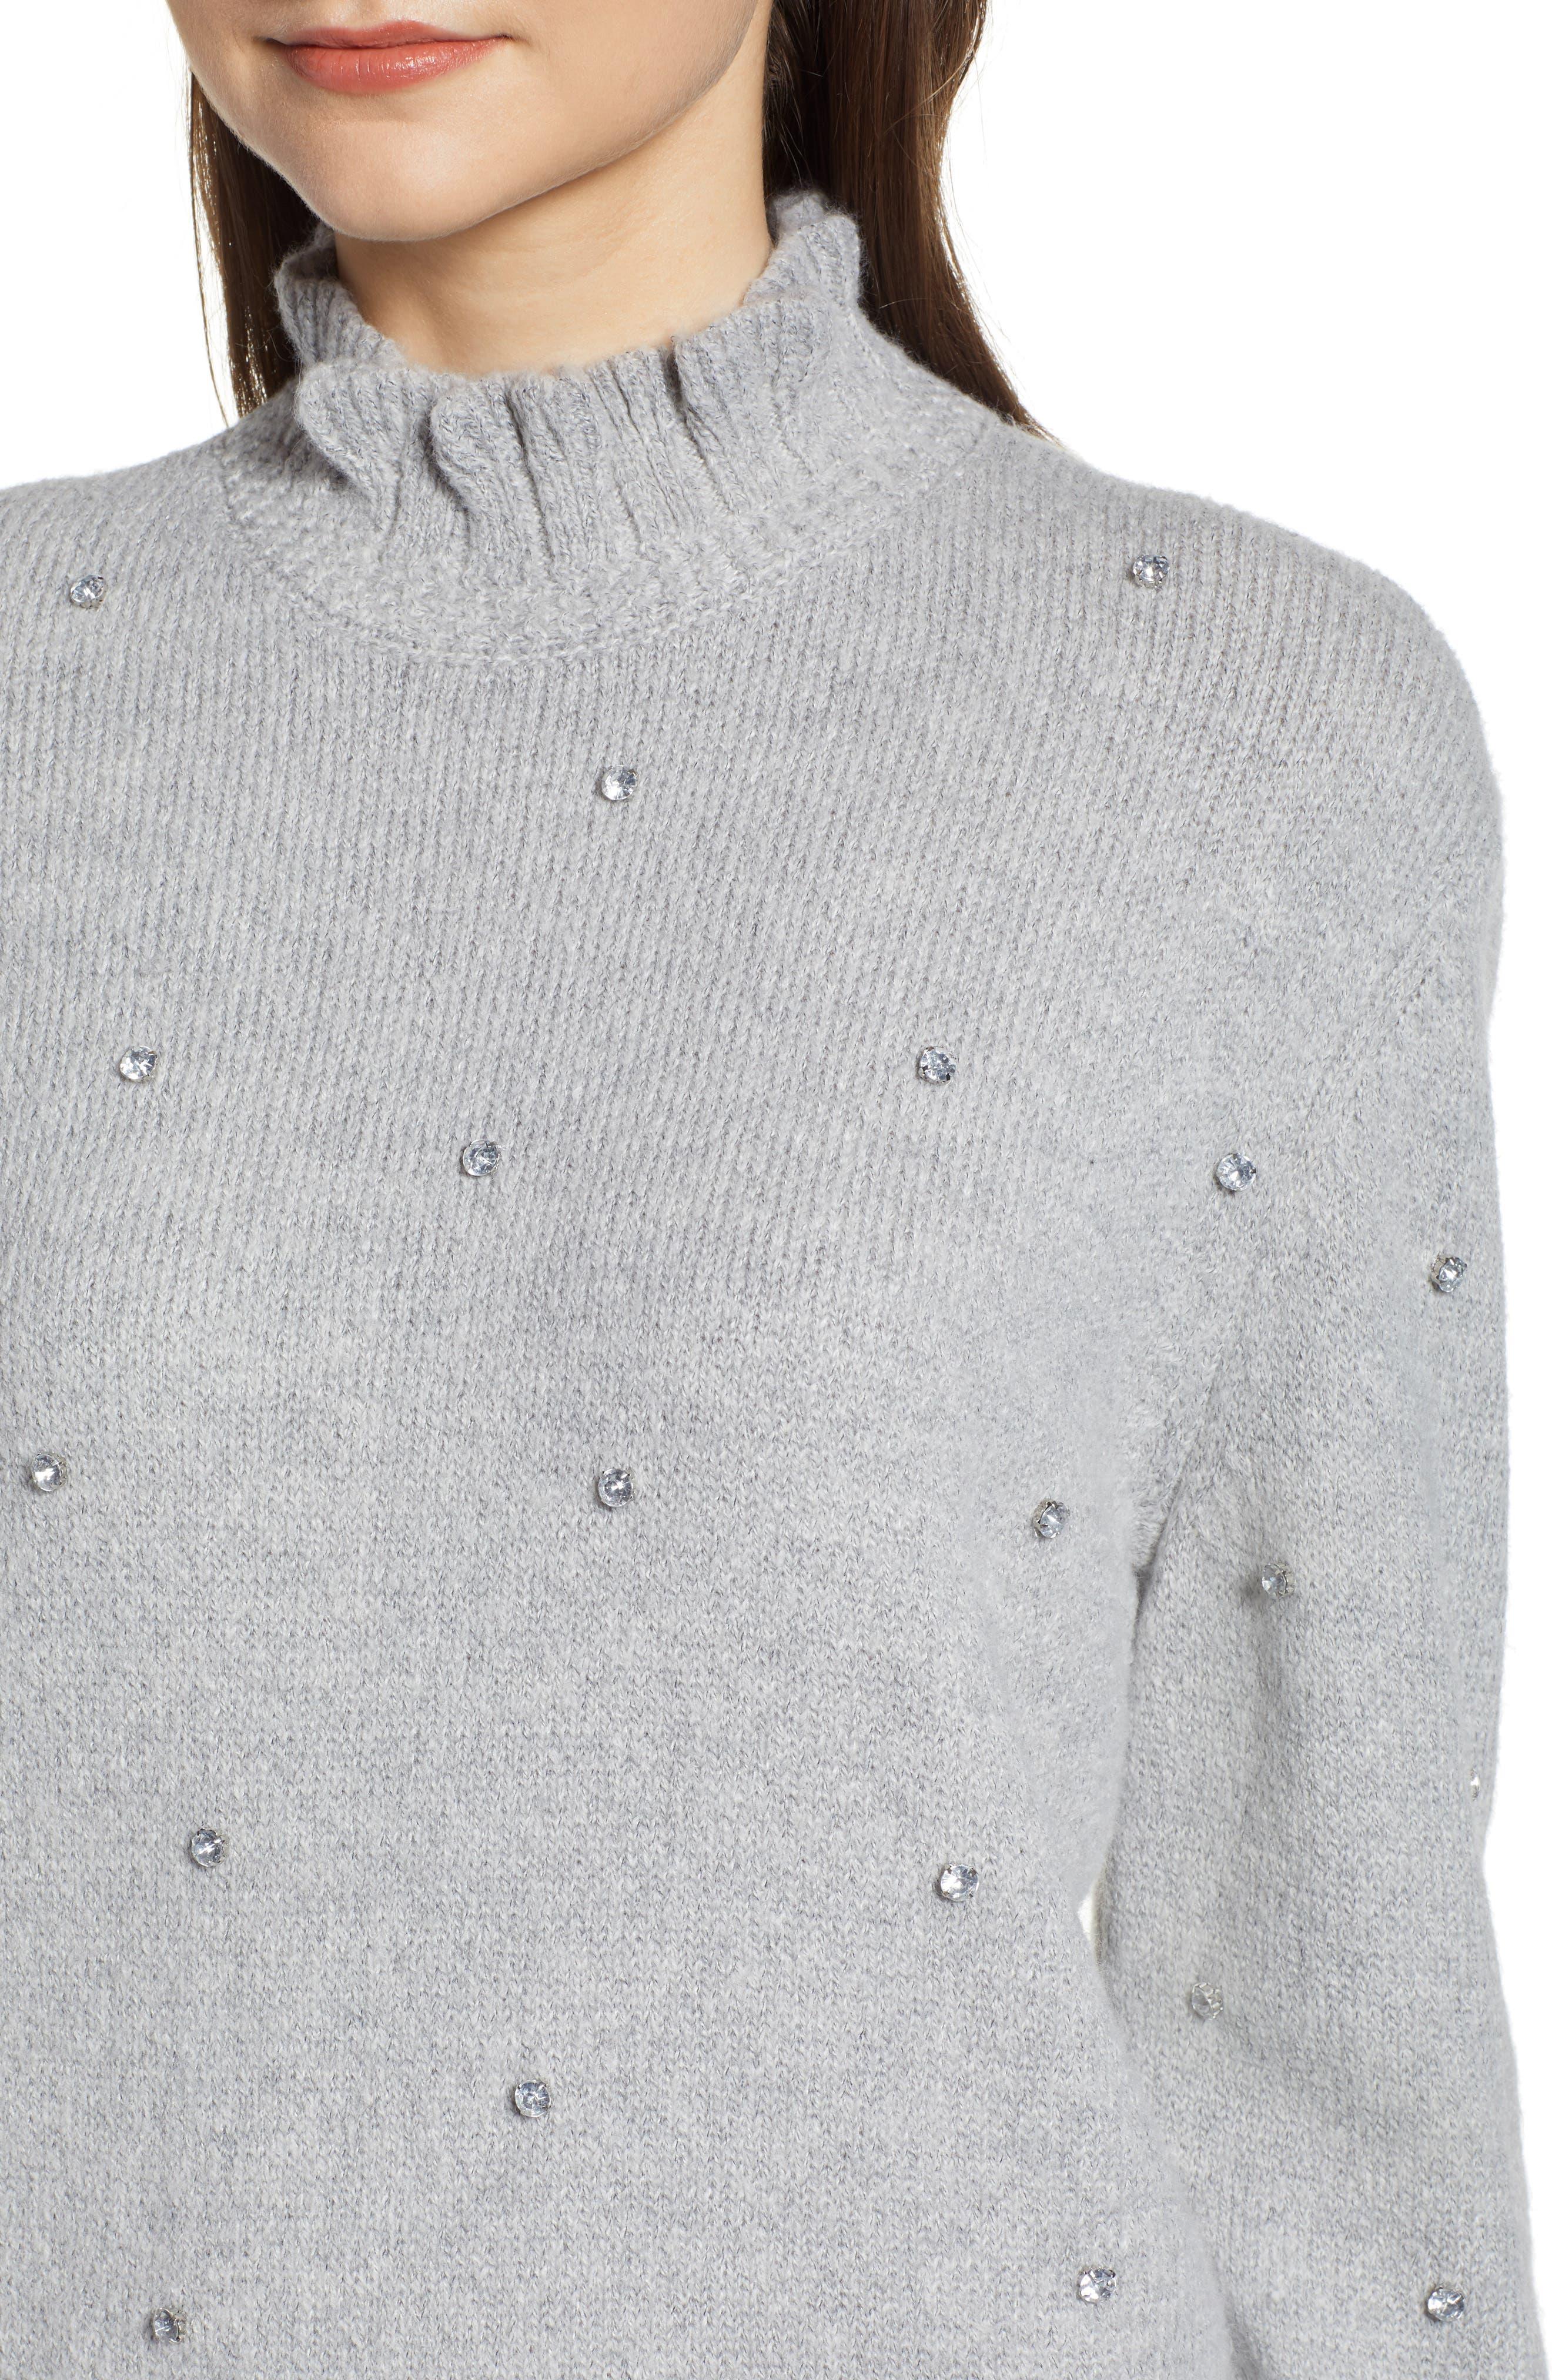 Embellished Ruffle Neck Sweater,                             Alternate thumbnail 4, color,                             GREY LIGHT HEATHER